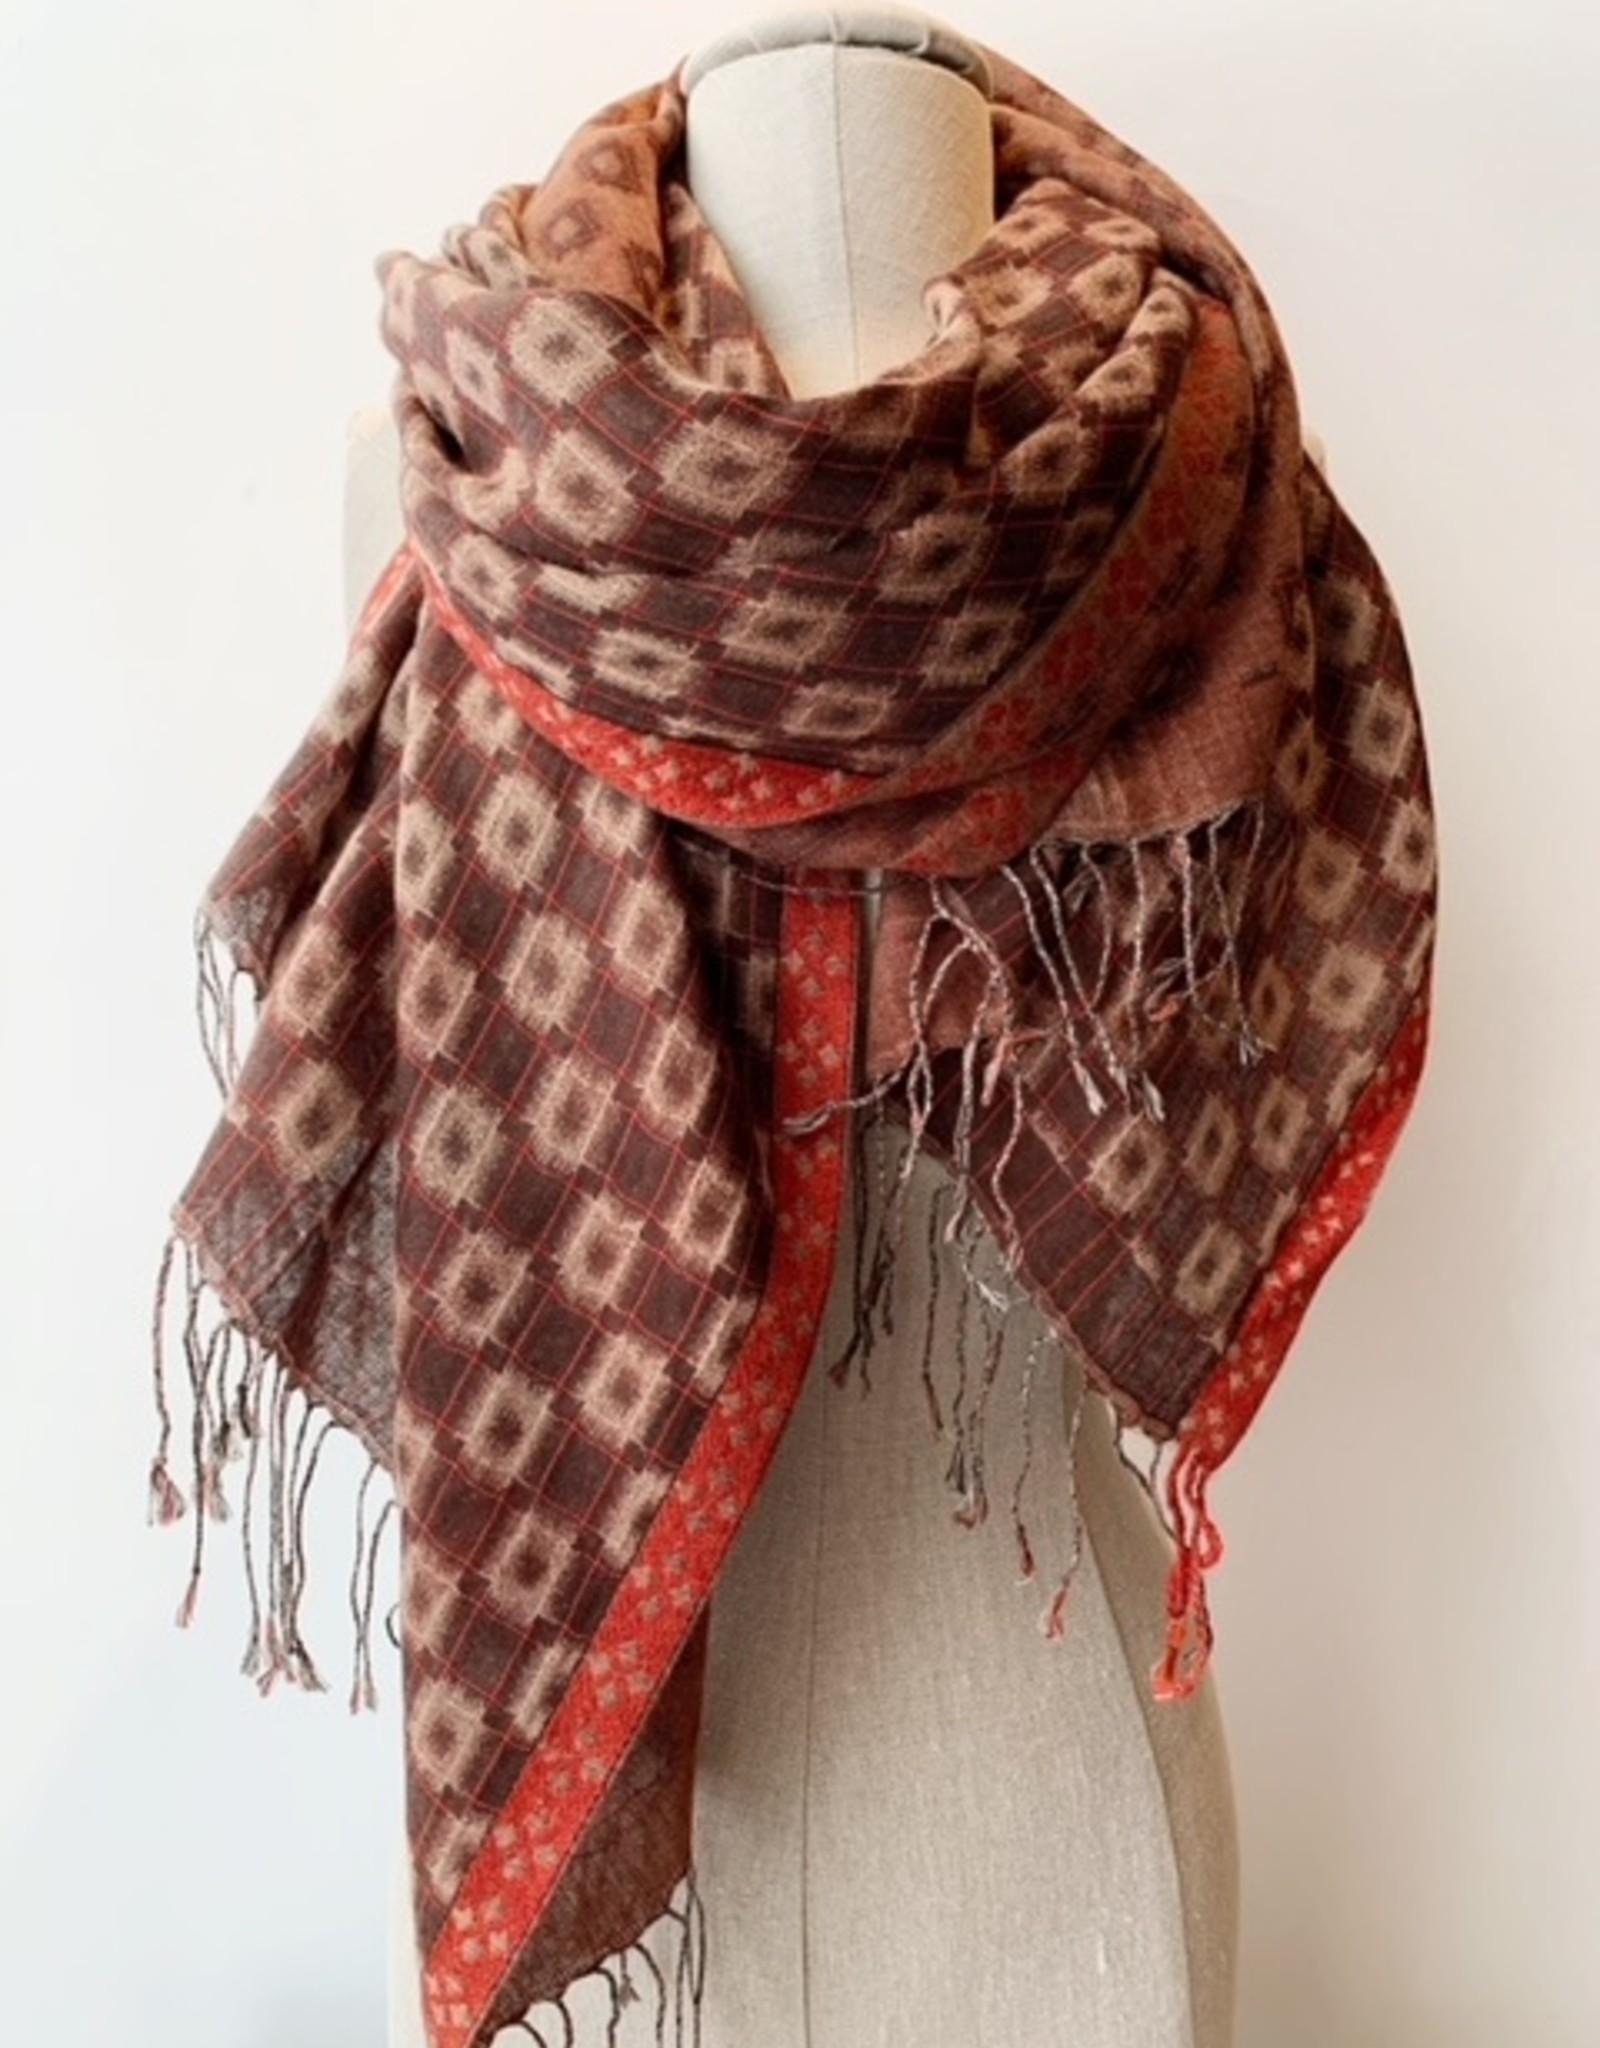 Saachi Saachi vibrant colored scarf